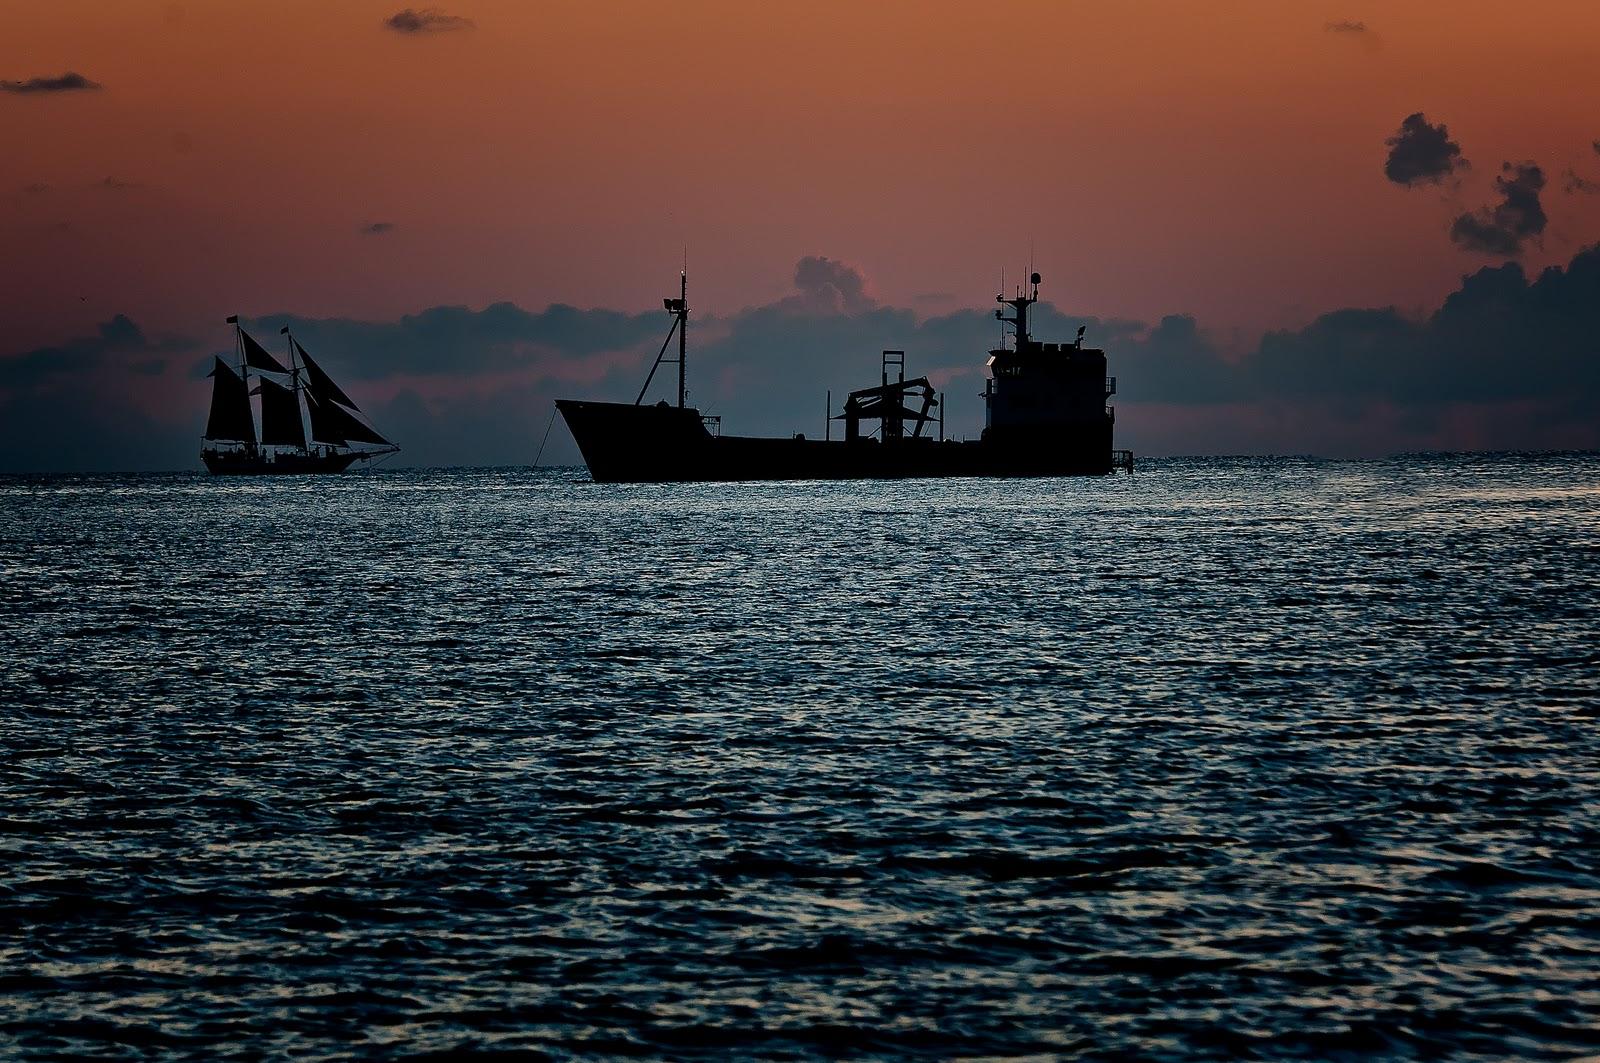 JP BRANDANO: FLORIDAS FINE ART PHOTOGRAPHERS: THE PIER IN